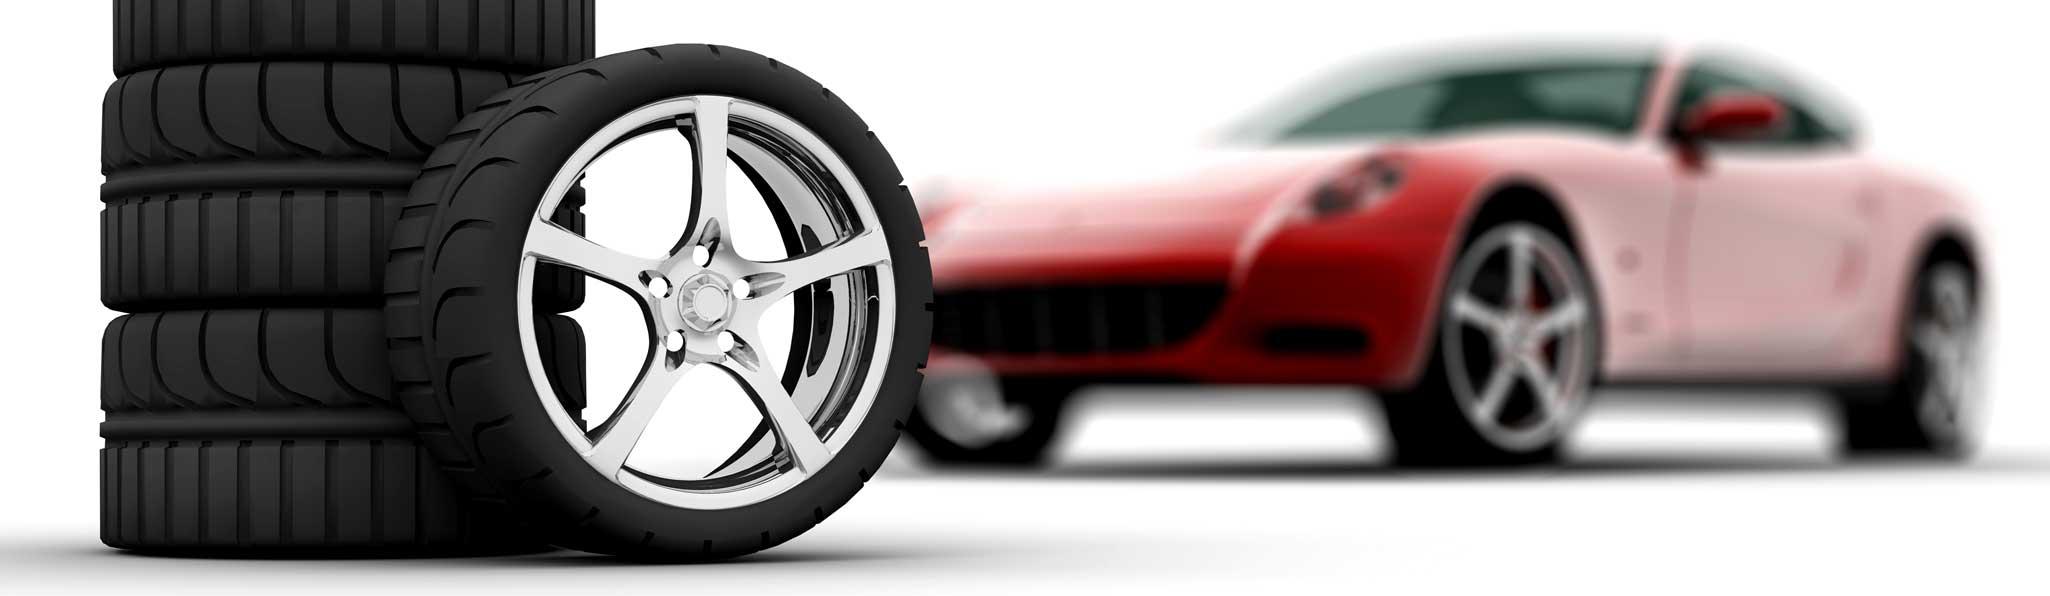 tyreco tyres suspension wanneroo wangara perth wa. Black Bedroom Furniture Sets. Home Design Ideas